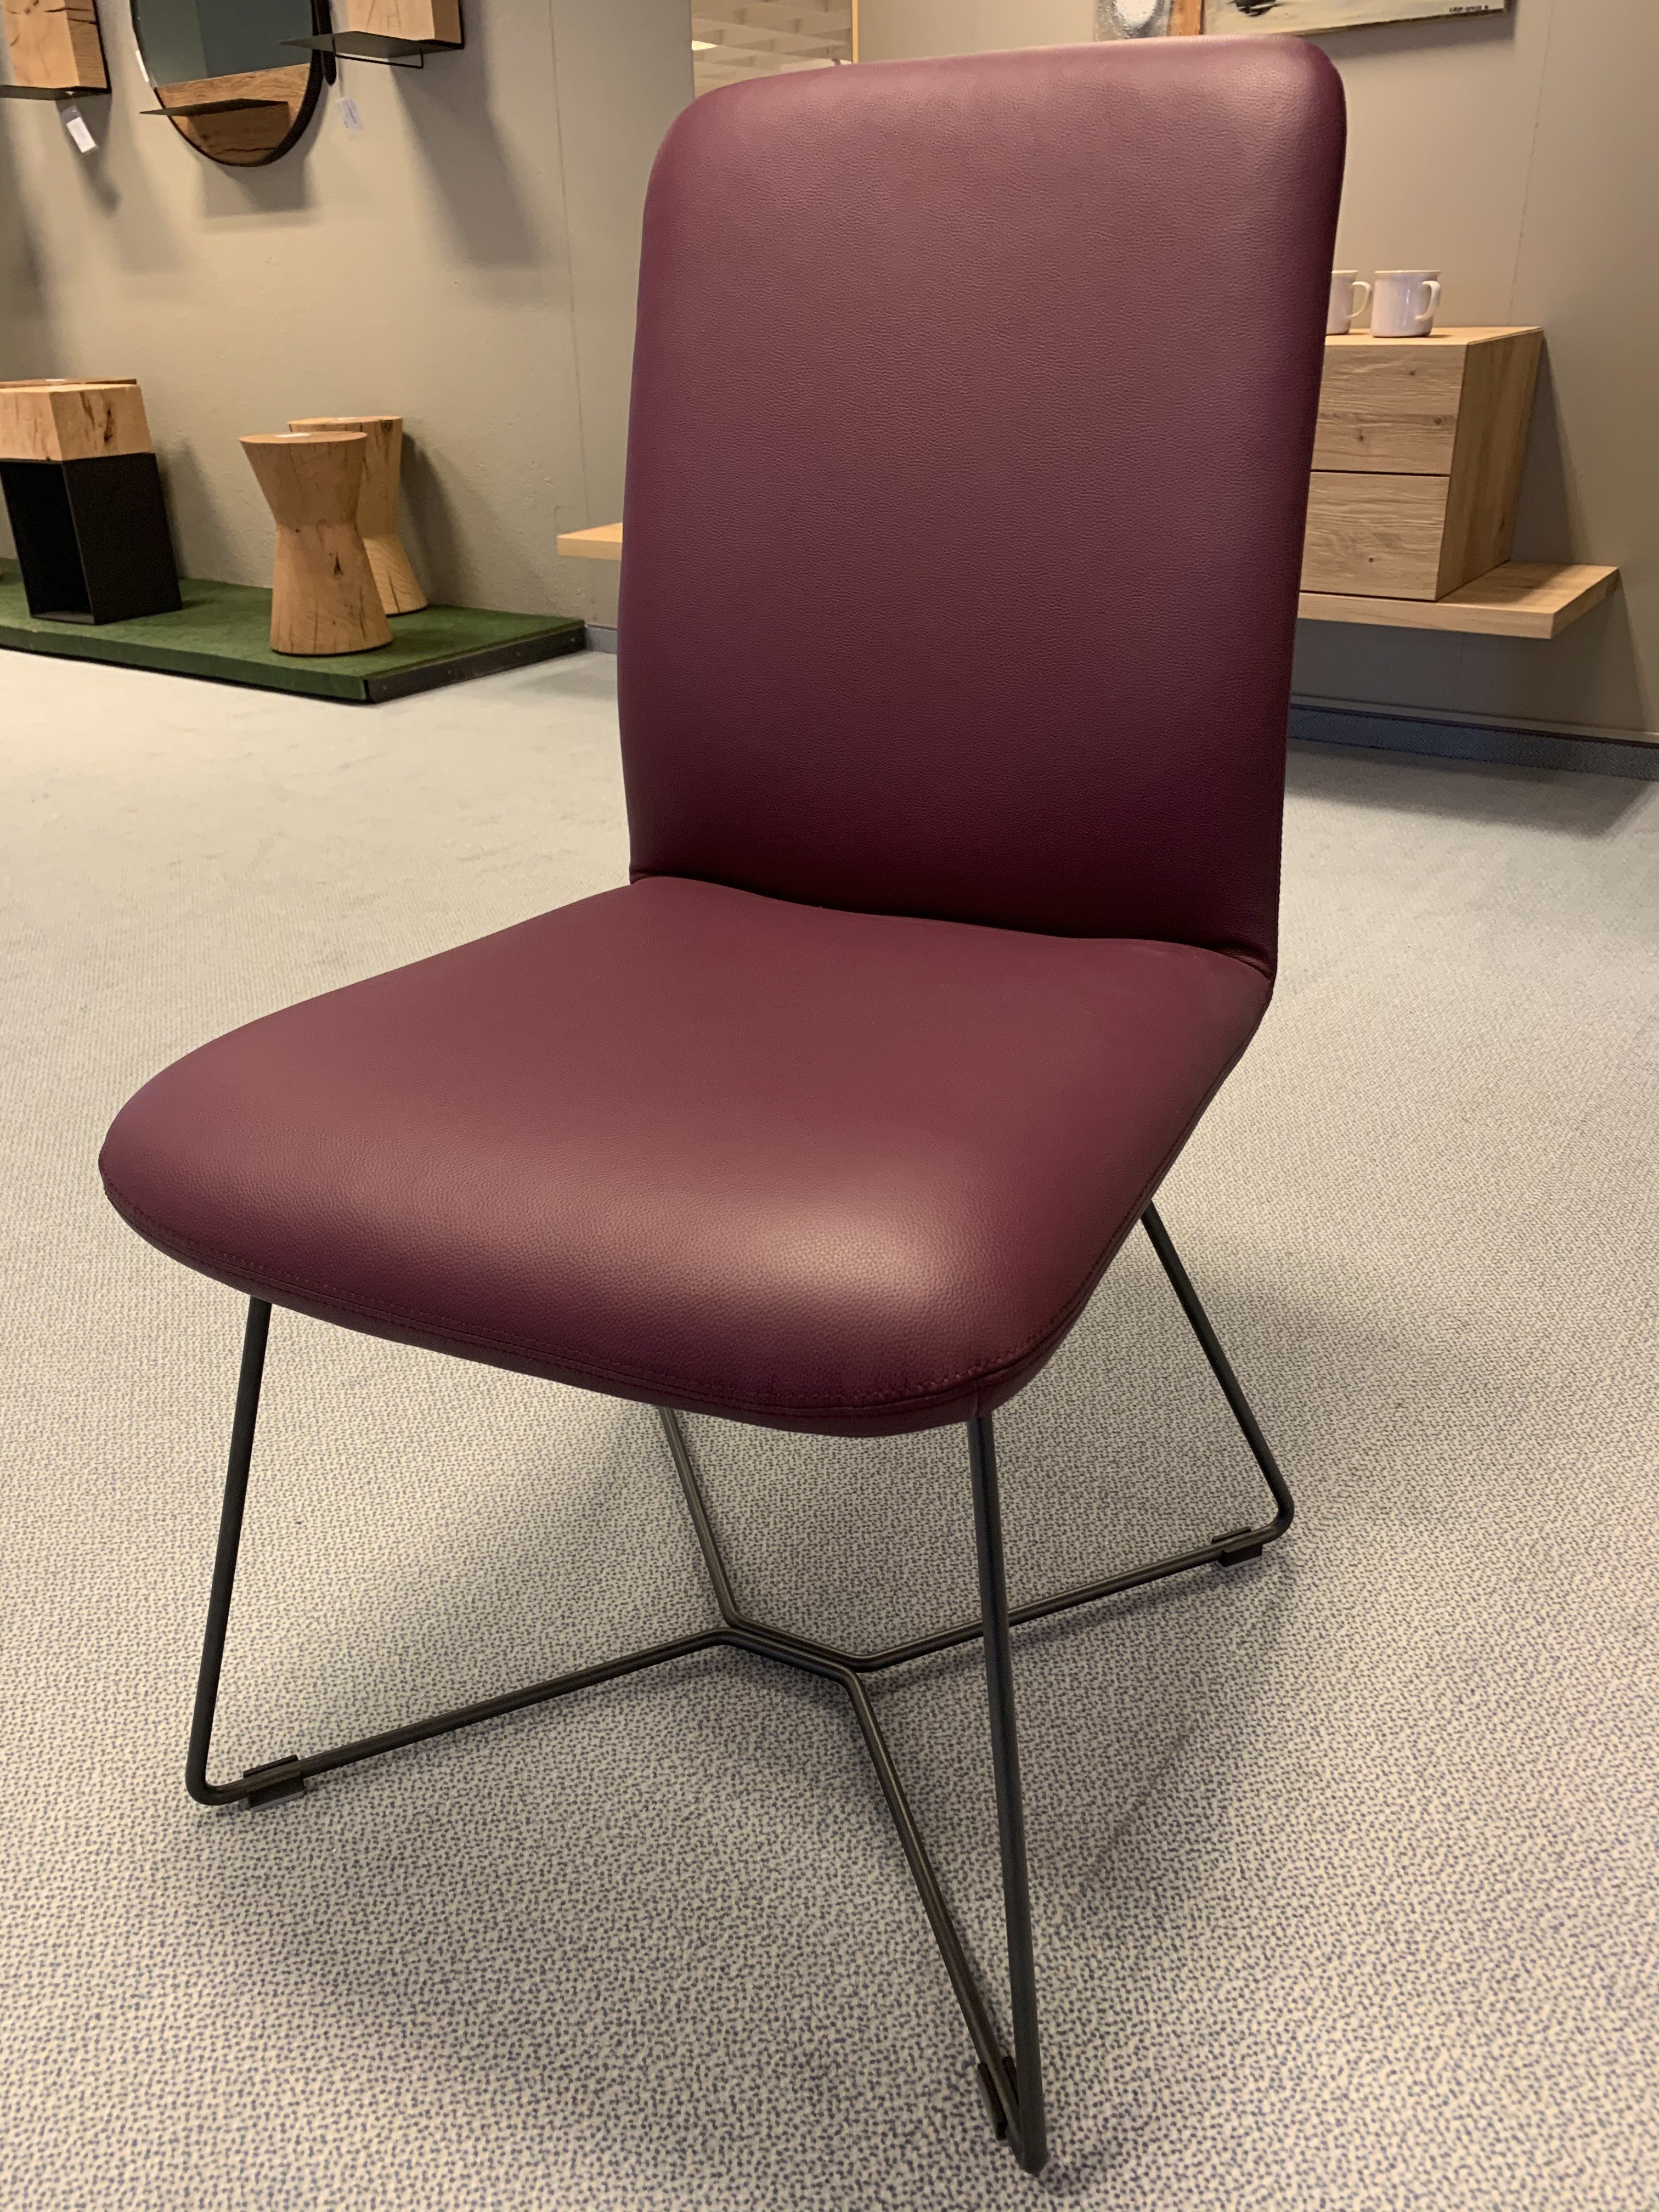 Stühle Bauma sitzplatz (6 STK) 01